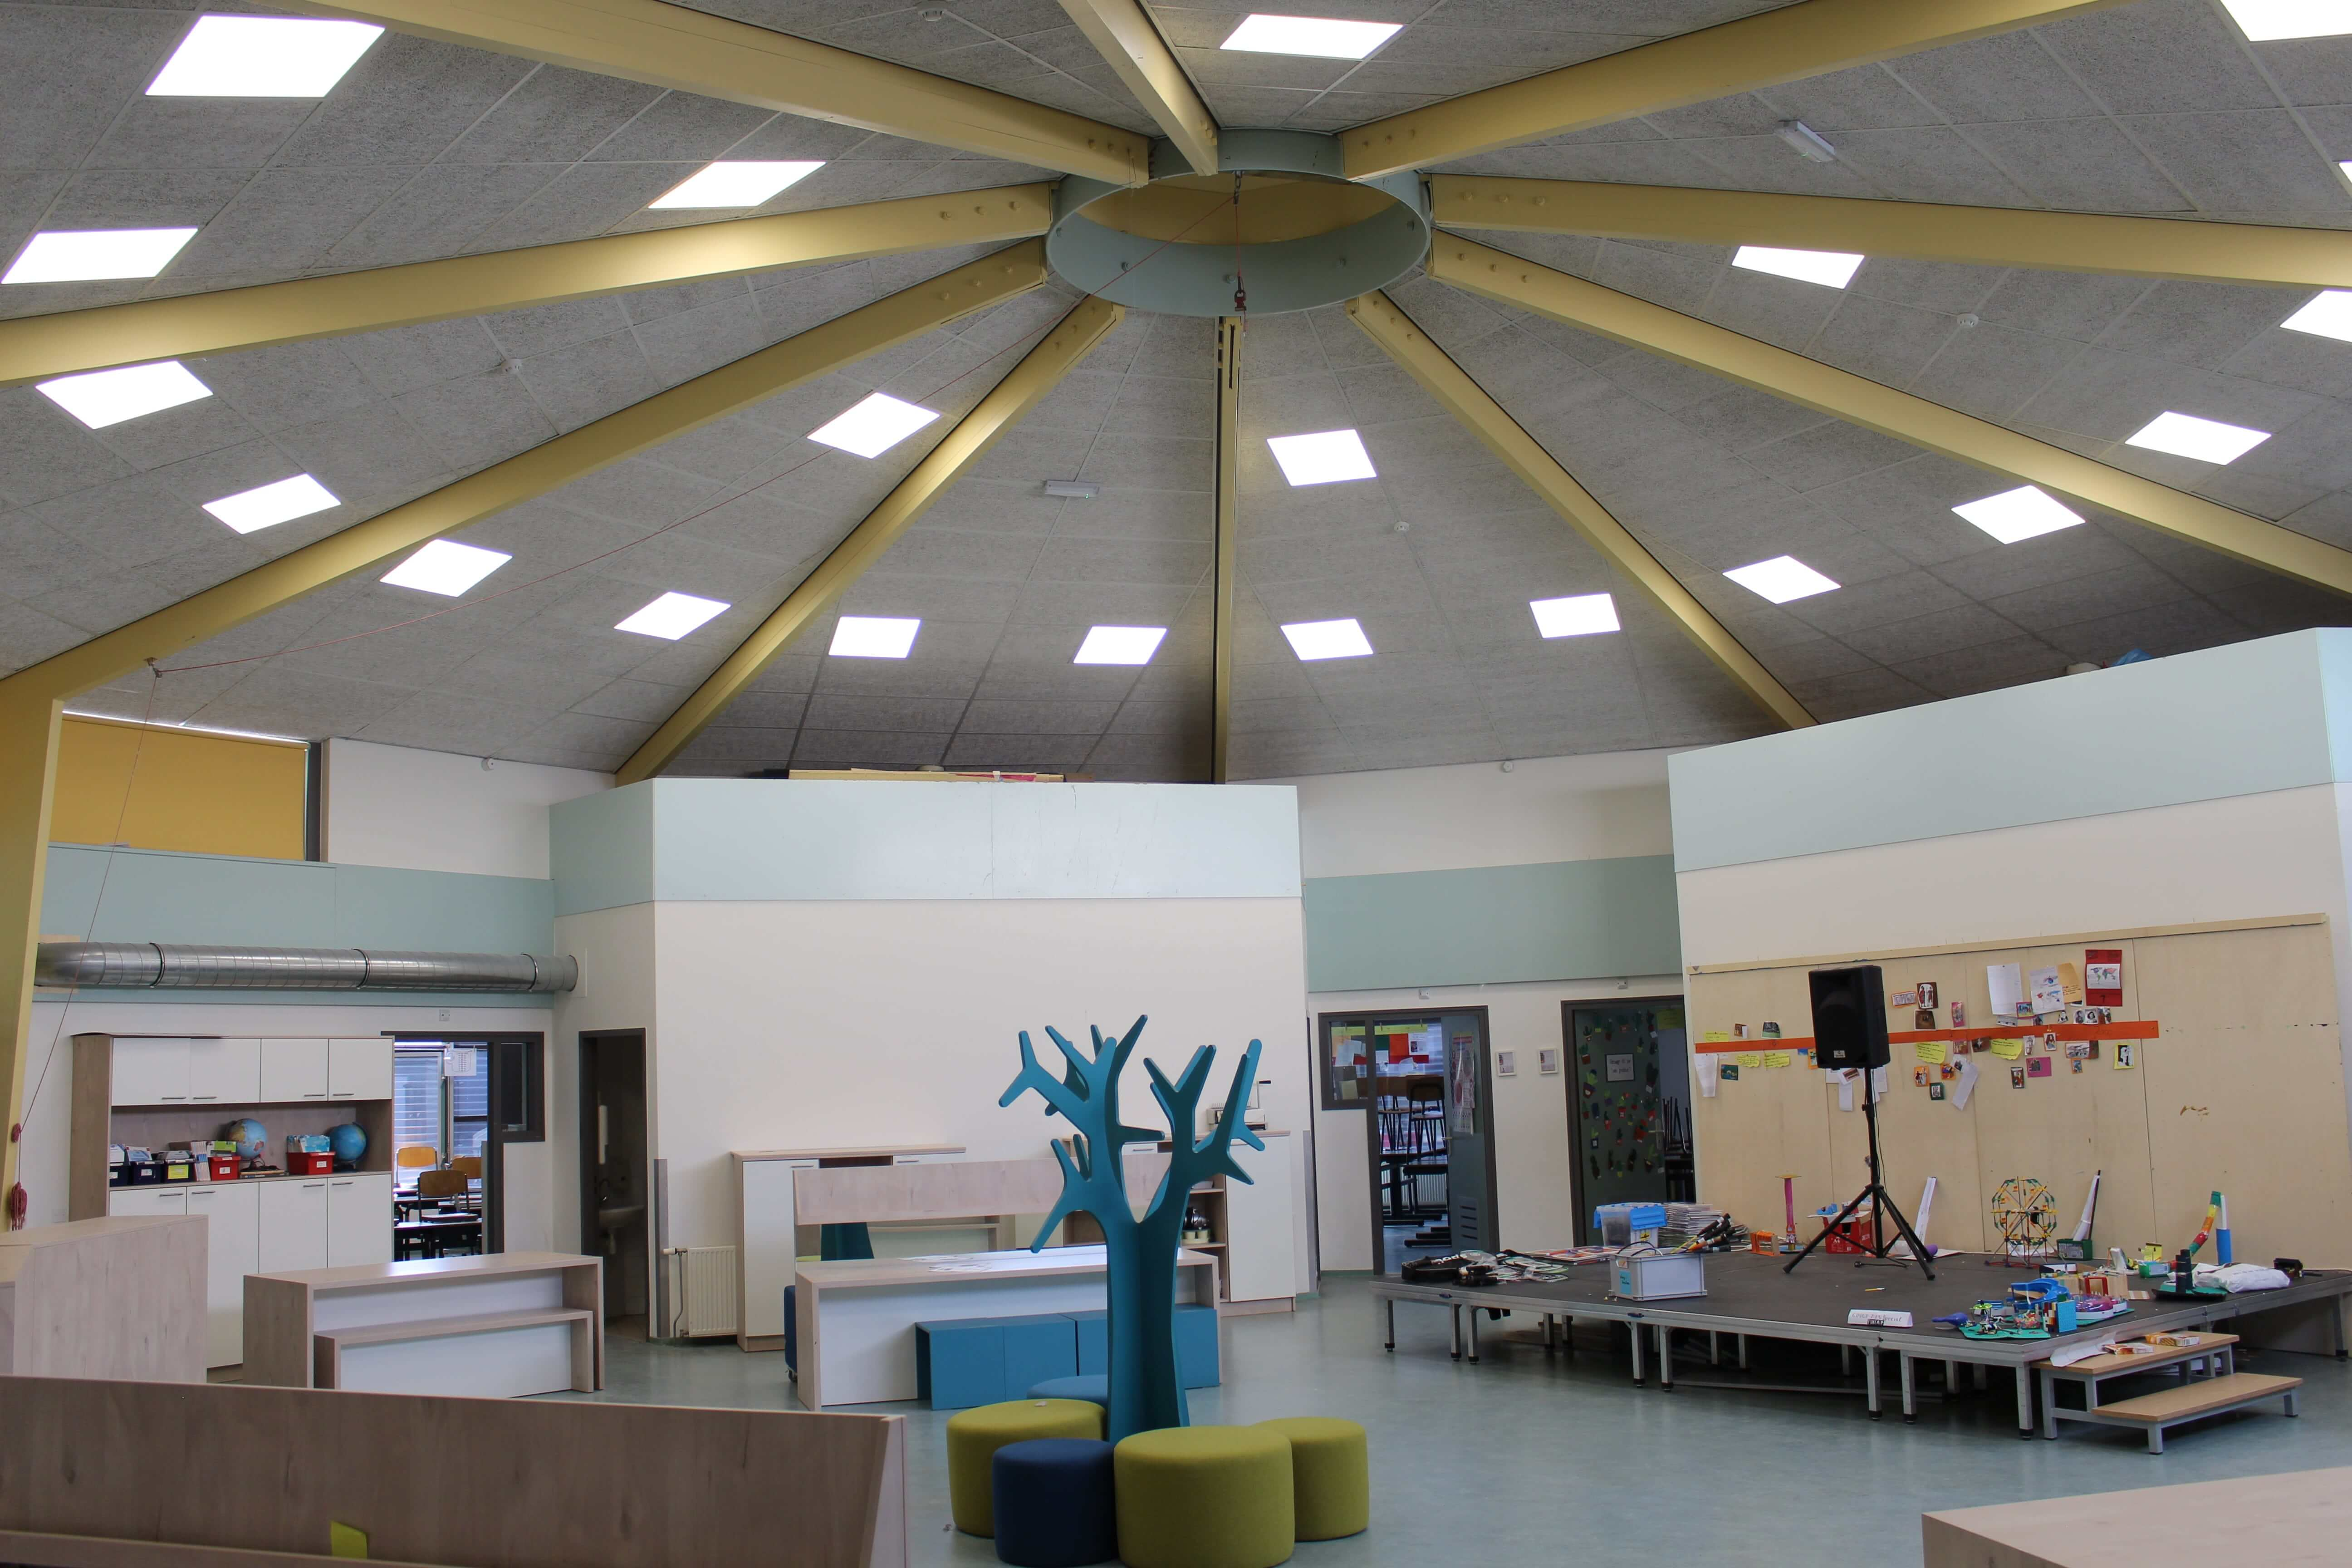 Prinses Beatrixschool in Urk plaats led verlichting van Saled